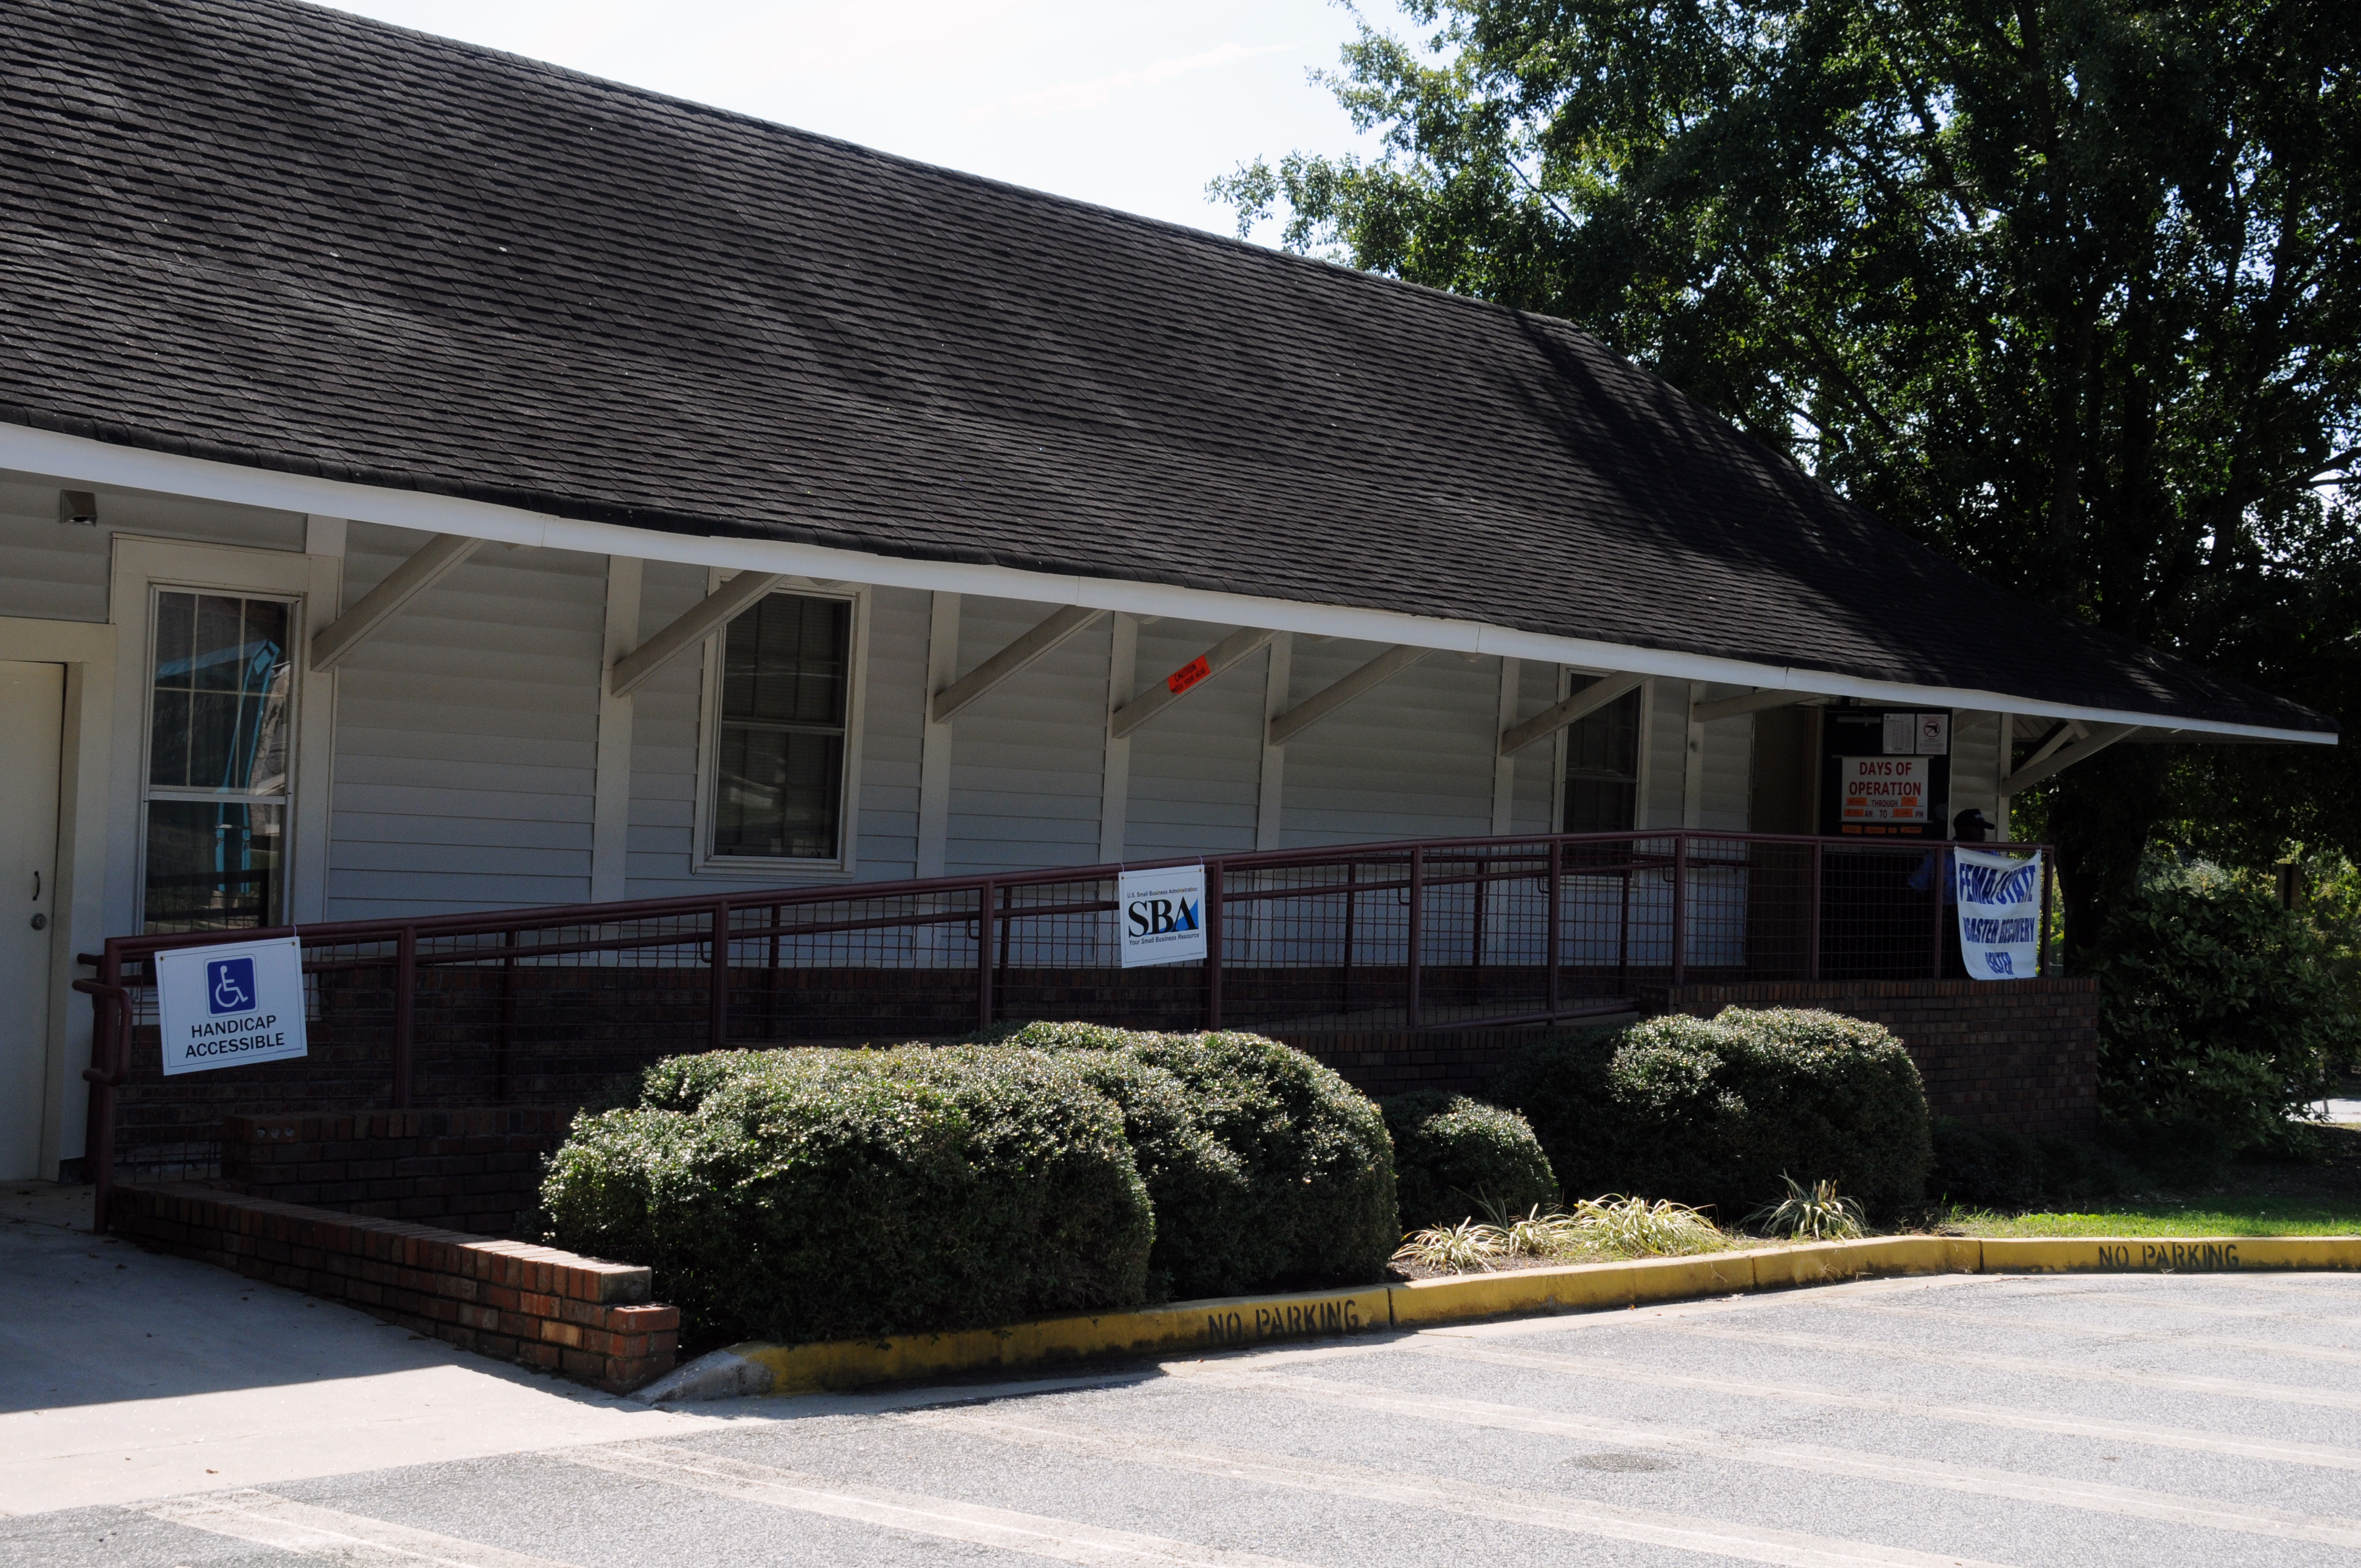 Gwinnett County Government Annex Building